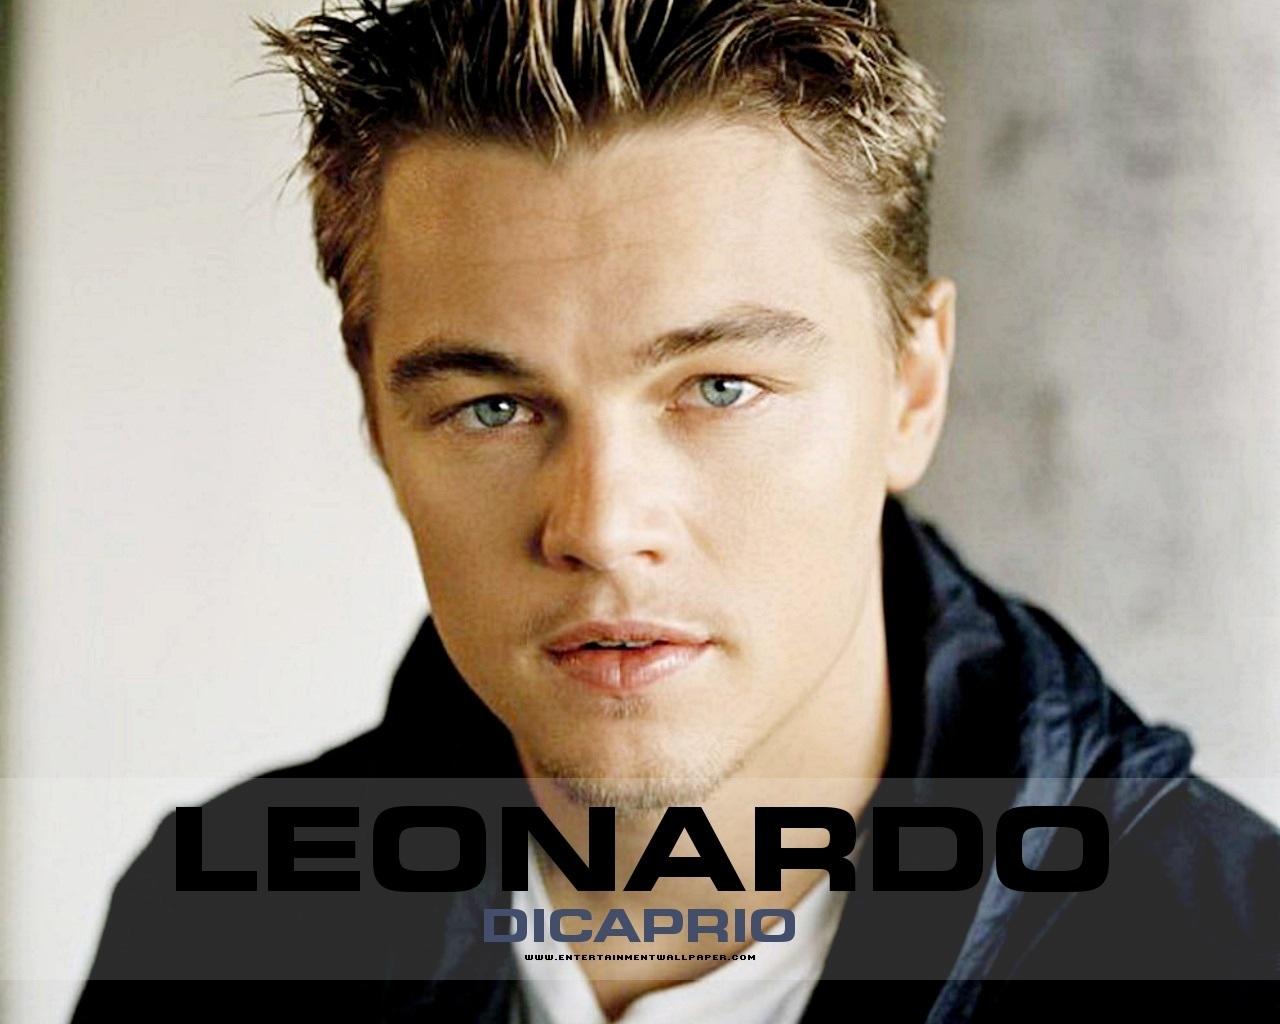 http://4.bp.blogspot.com/-hl2OV4JW-xc/UFxK-nJLOzI/AAAAAAAAS2Q/vQ2YmCMmJx0/s1600/Leonardo-DiCaprio-leonardo-dicaprio-16946706-1280-1024.jpg